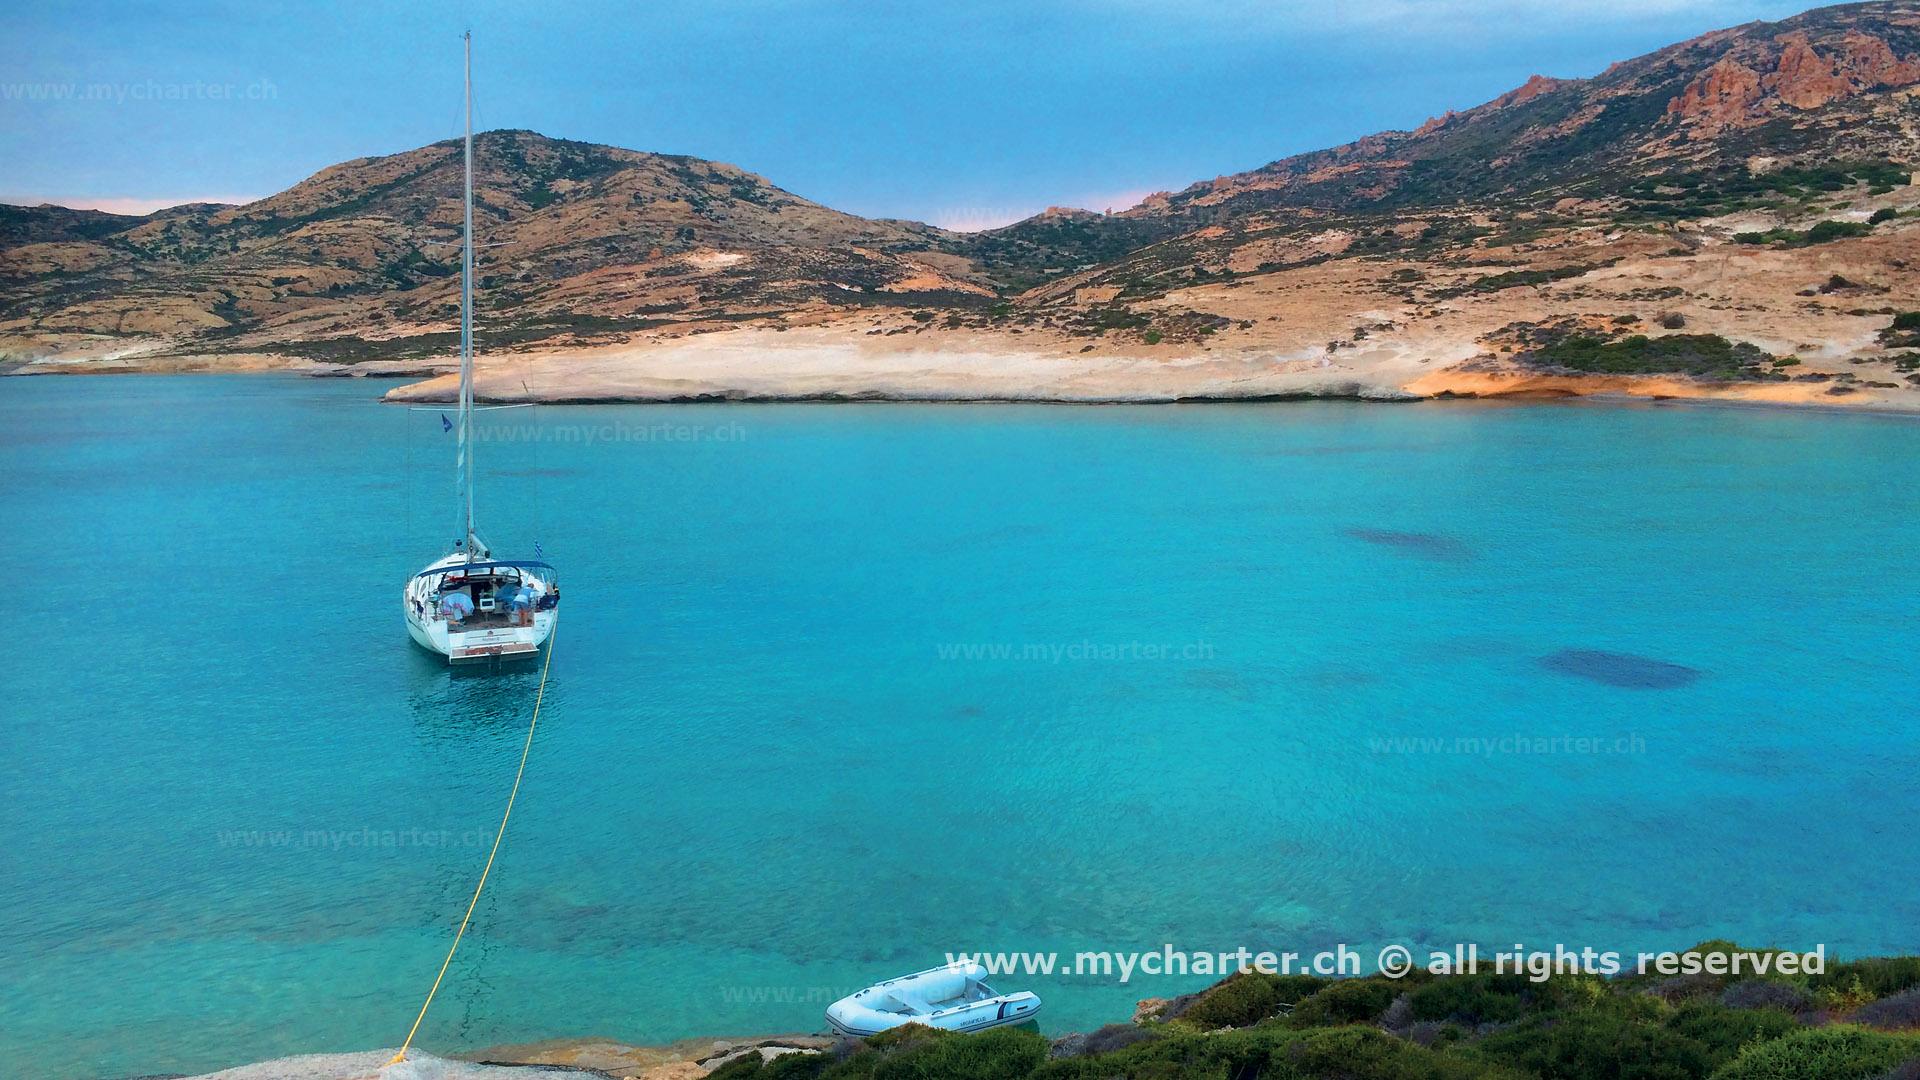 Griechenland - Polyegos